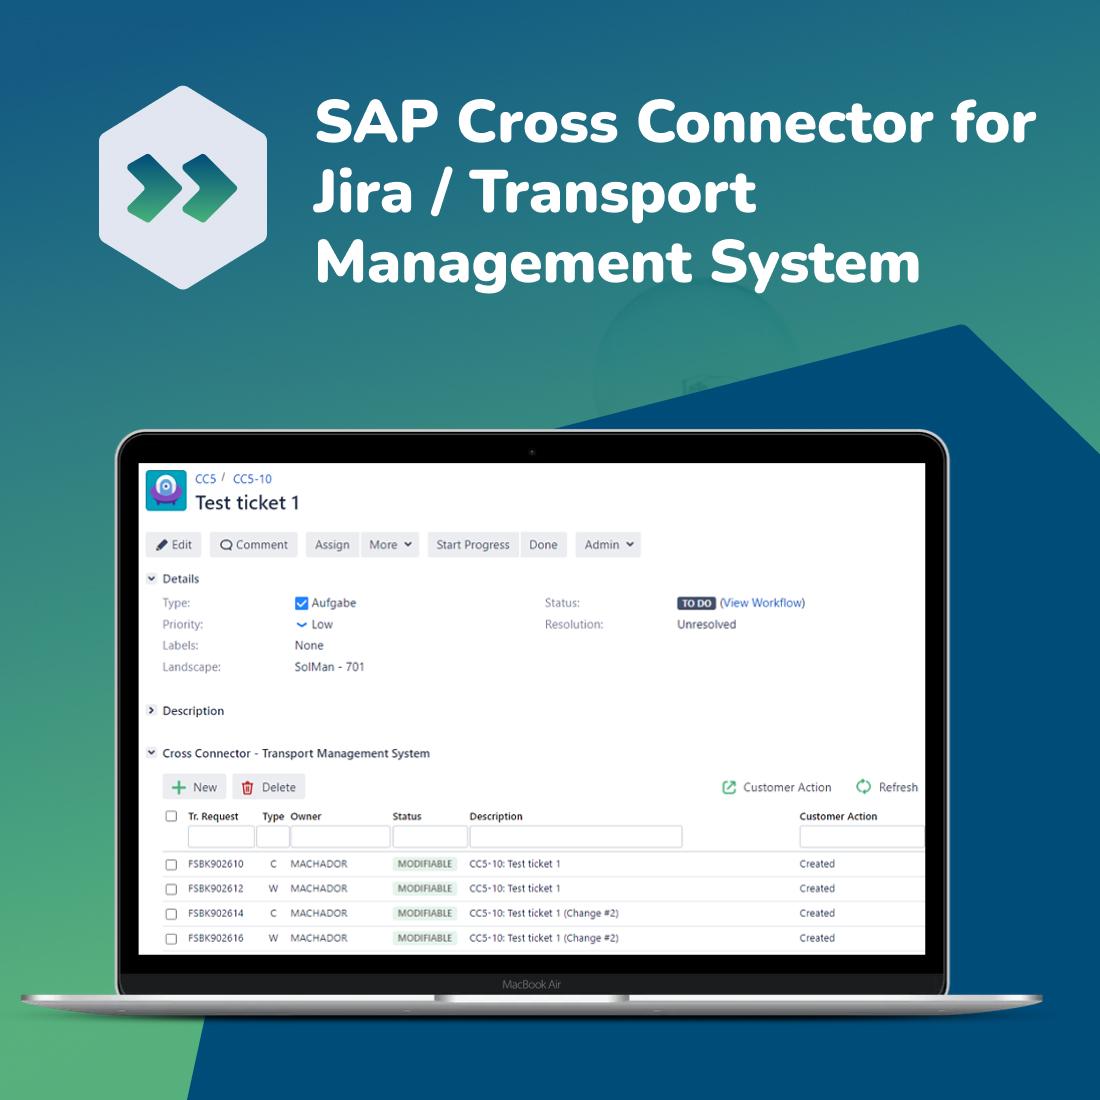 SAP-Jira-Transport-Management-System